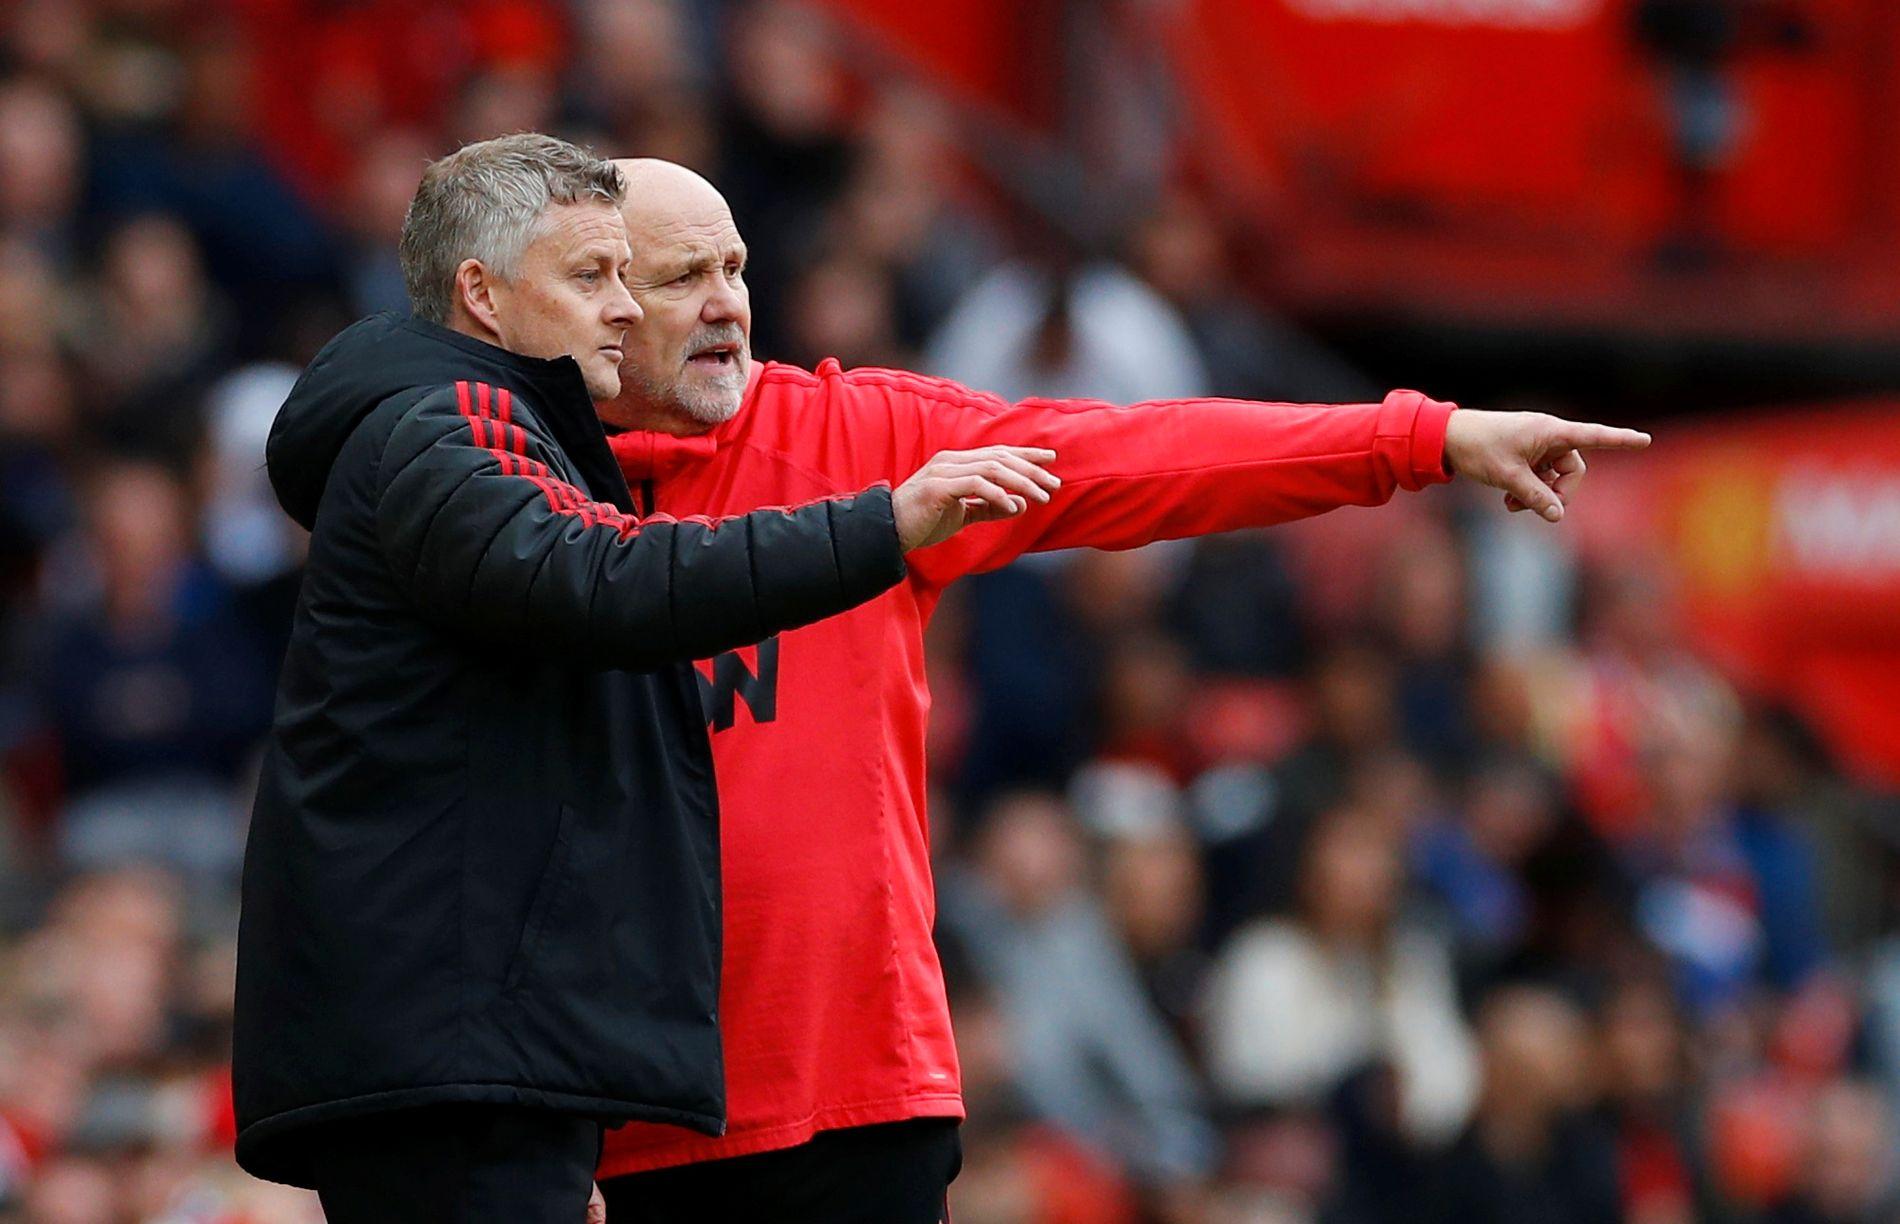 KAN FÅ NY ROLLE: Assistenttrener Mike Phelan (t.h.), som aldri er langt unna Ole Gunnar Solskjær under Manchester Uniteds kamper, kobles til en rolle som ny «teknisk direktør» i klubben.